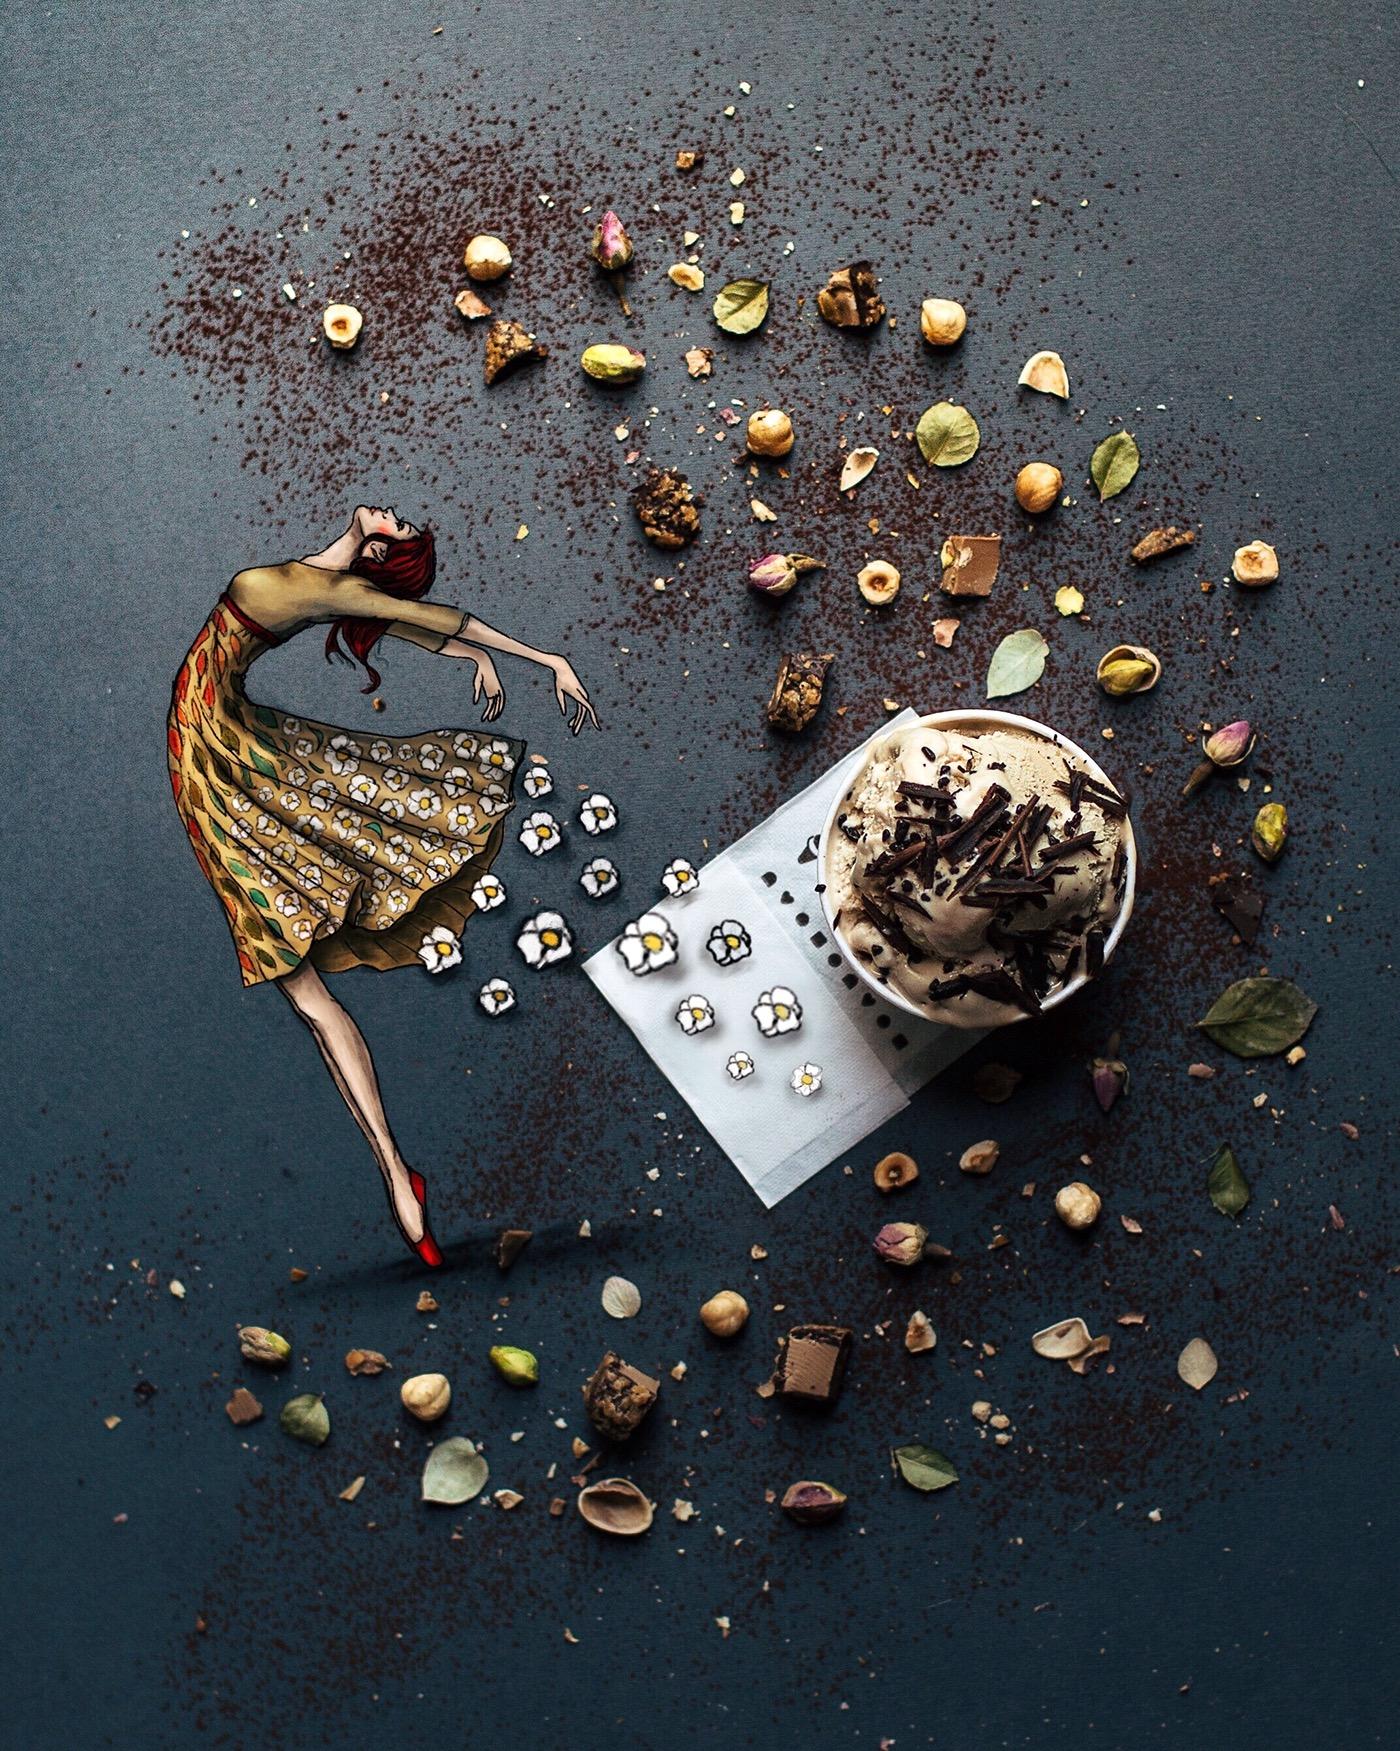 кофе открытка креатив